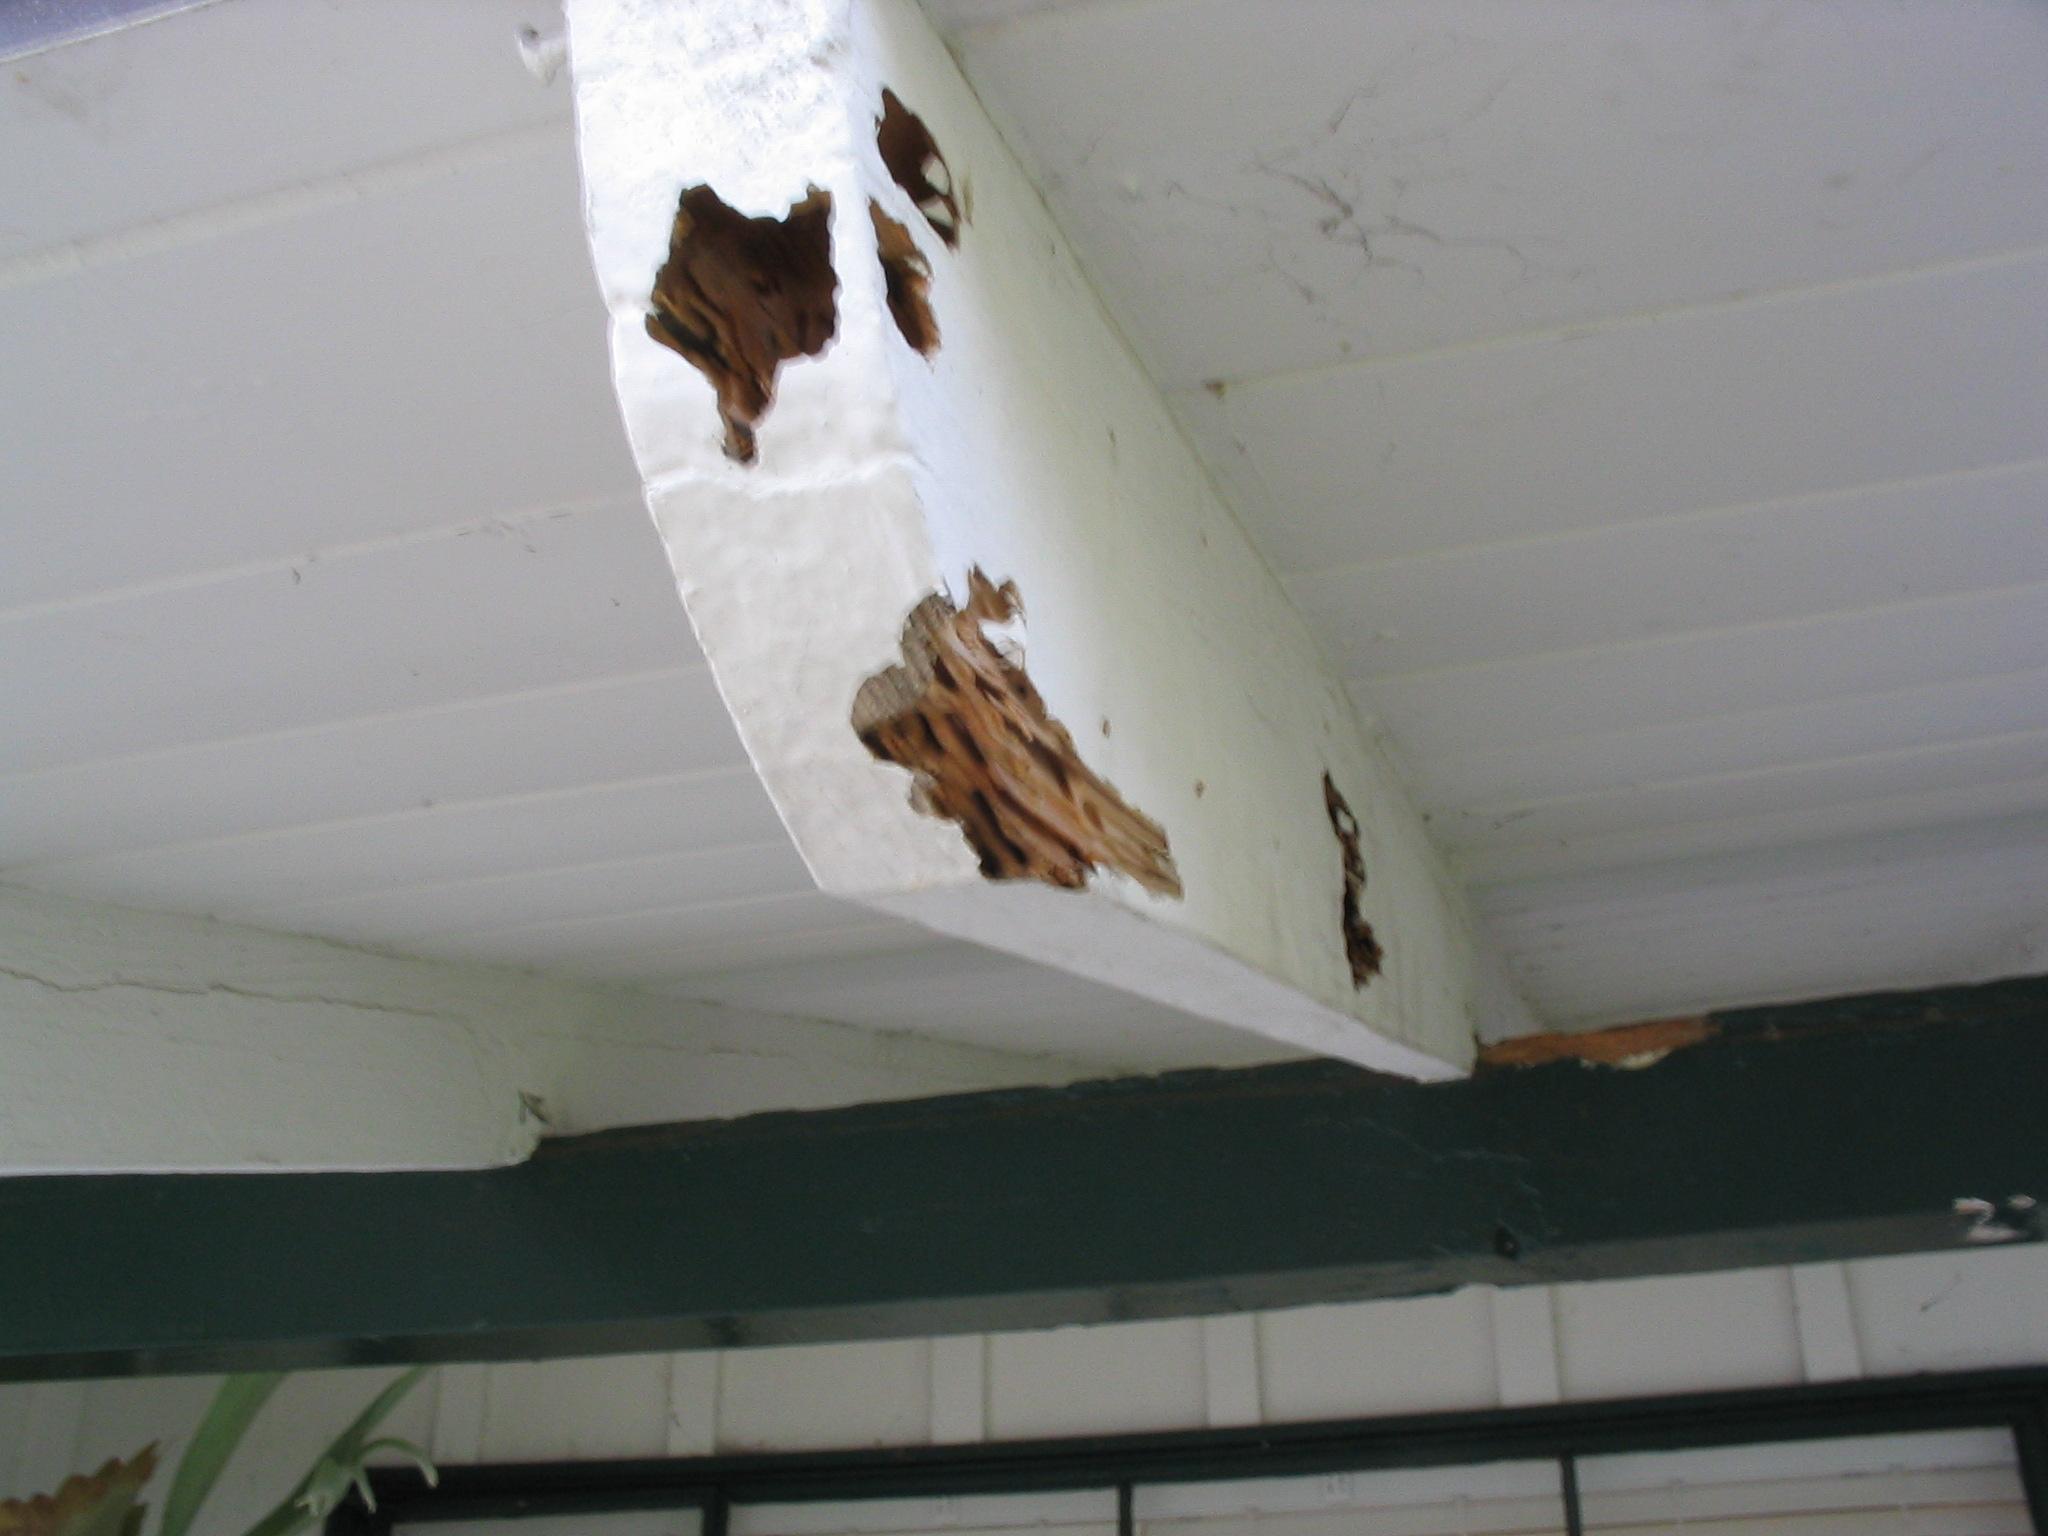 Drywood Termites In Albuquerque Rio Rancho Placitas